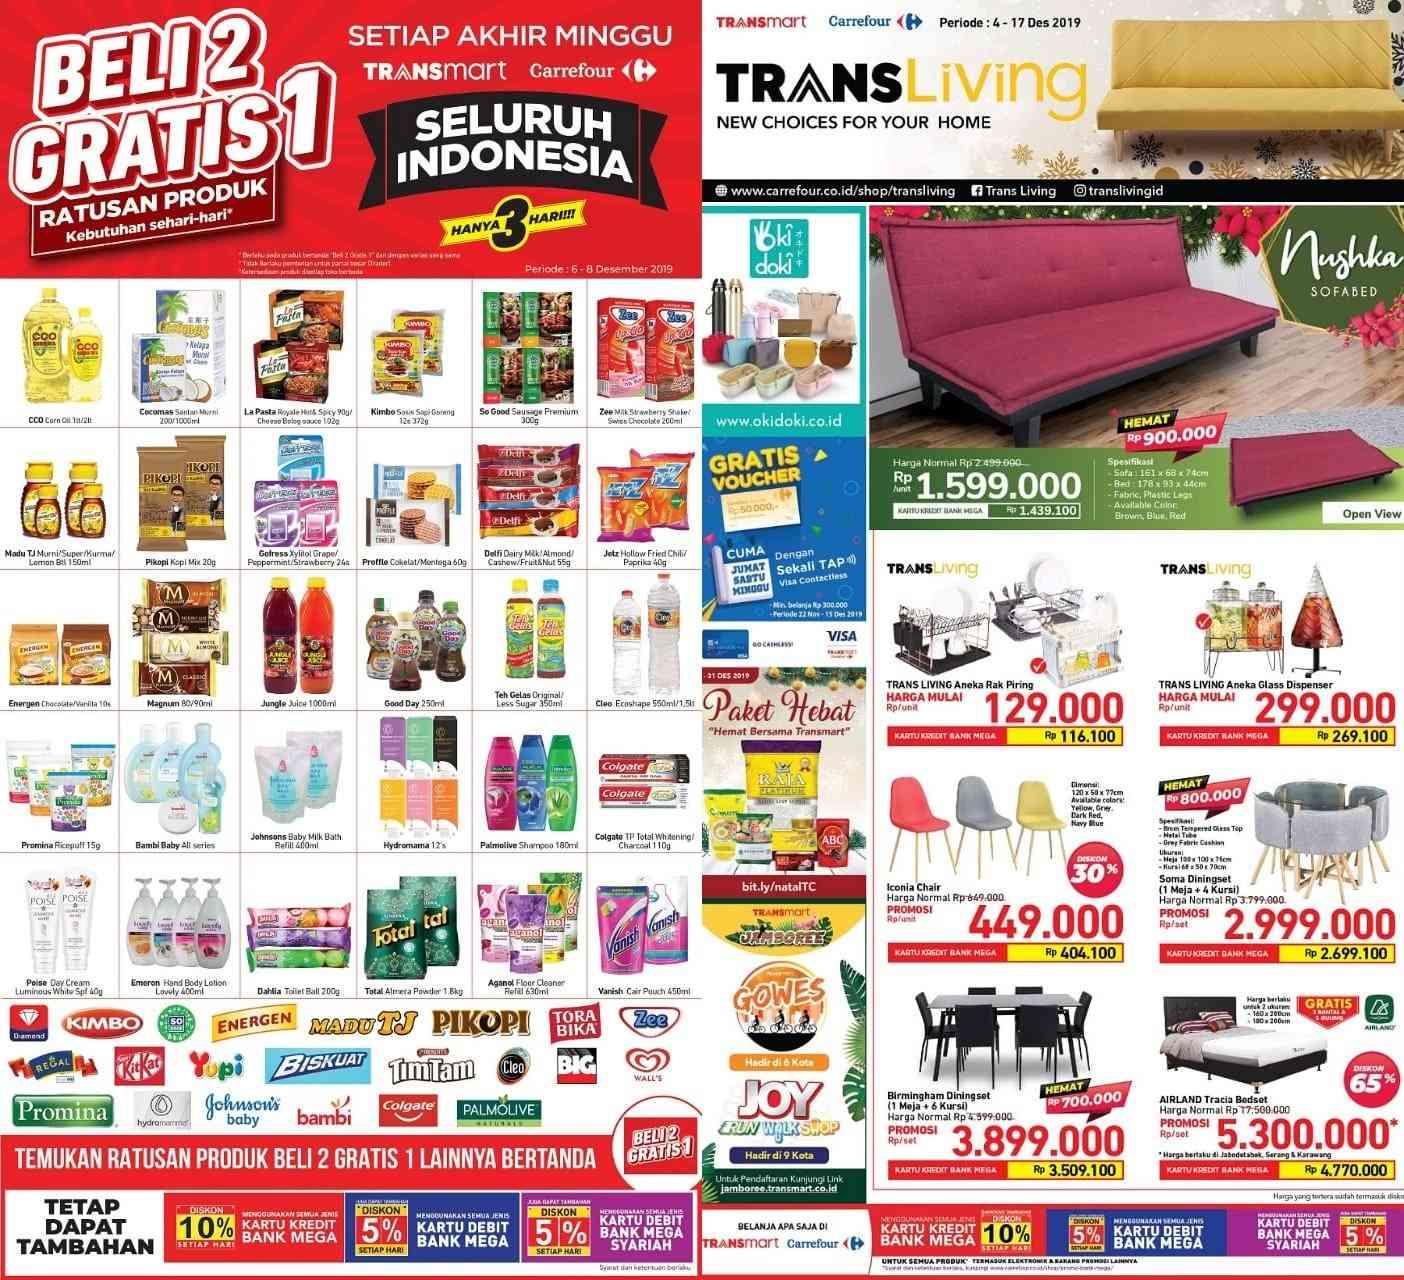 Transmart Carrefour Katalog Promo JSM Periode 6-8 Desember 2019